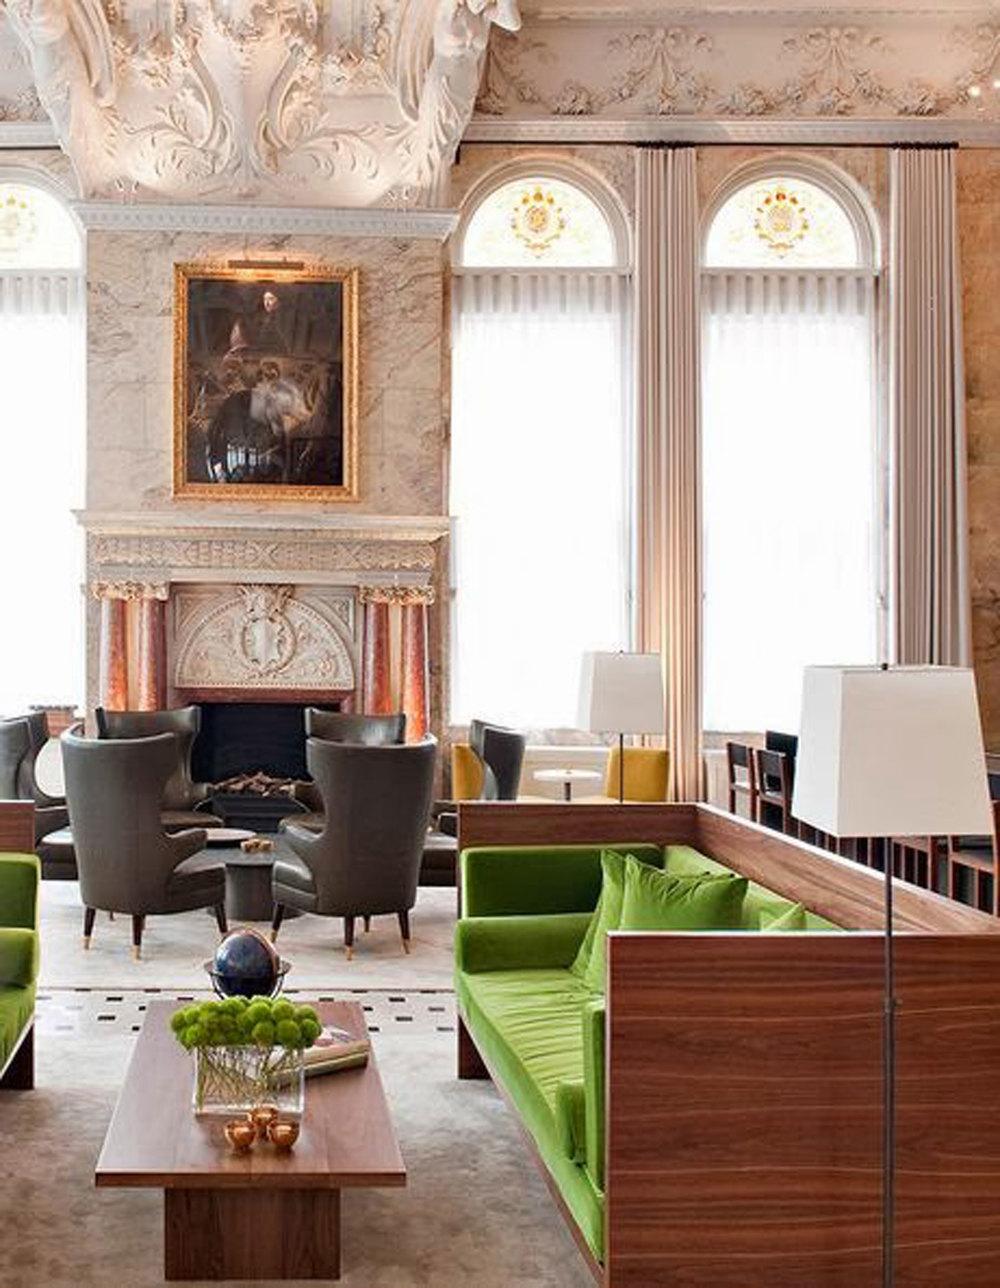 london-edition-hotel-habituallychic-001.jpg